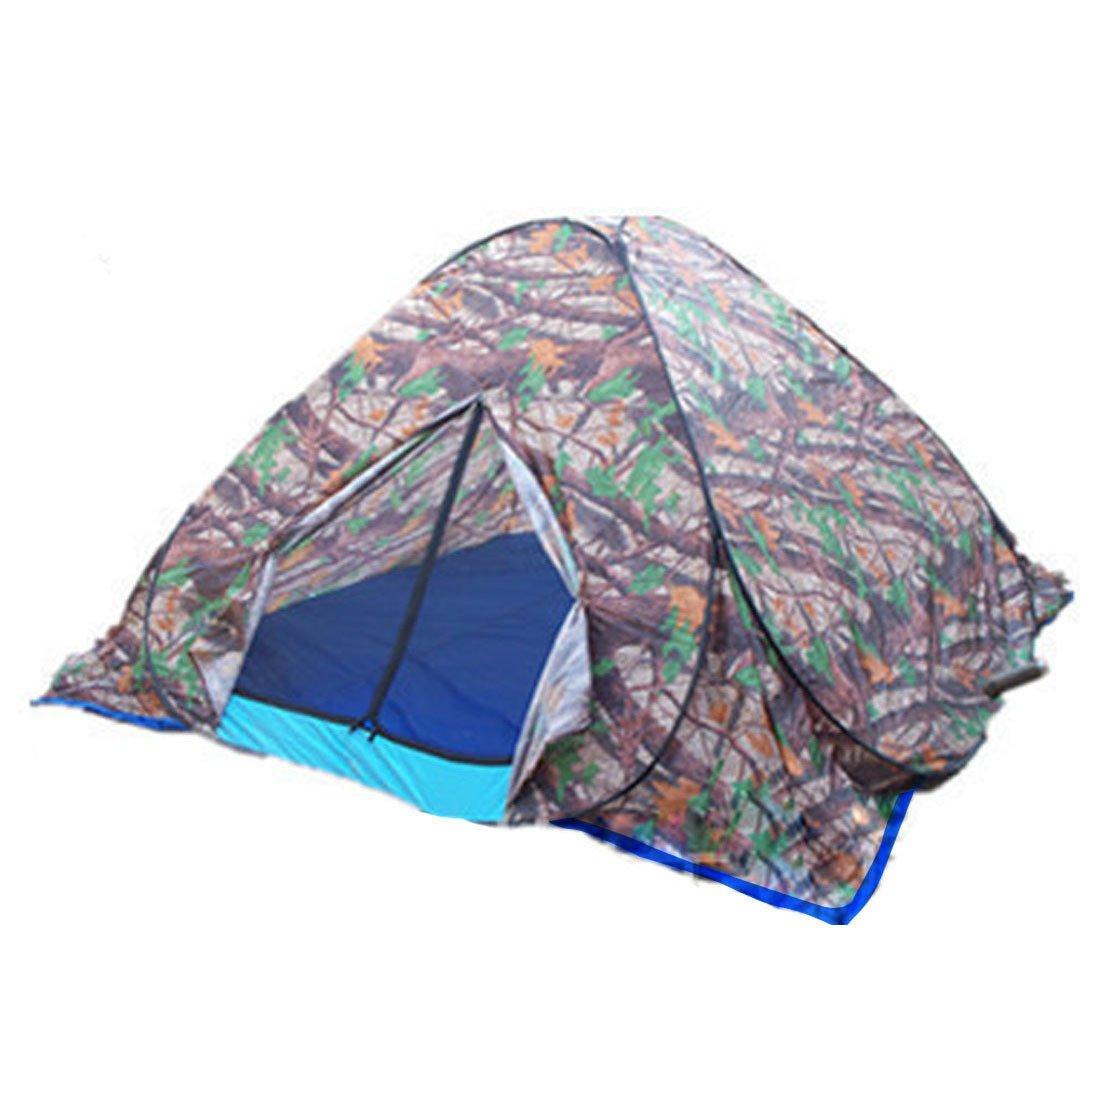 Hi Suyiアウトドアポータブル迷彩防水自動2 Man Pop Up Tent with Windowsキャンプハイキングバックパッキングビーチ釣り旅行with Carryバッグ  Tree camouflage 1.5x1.5 m B074FYK86Y